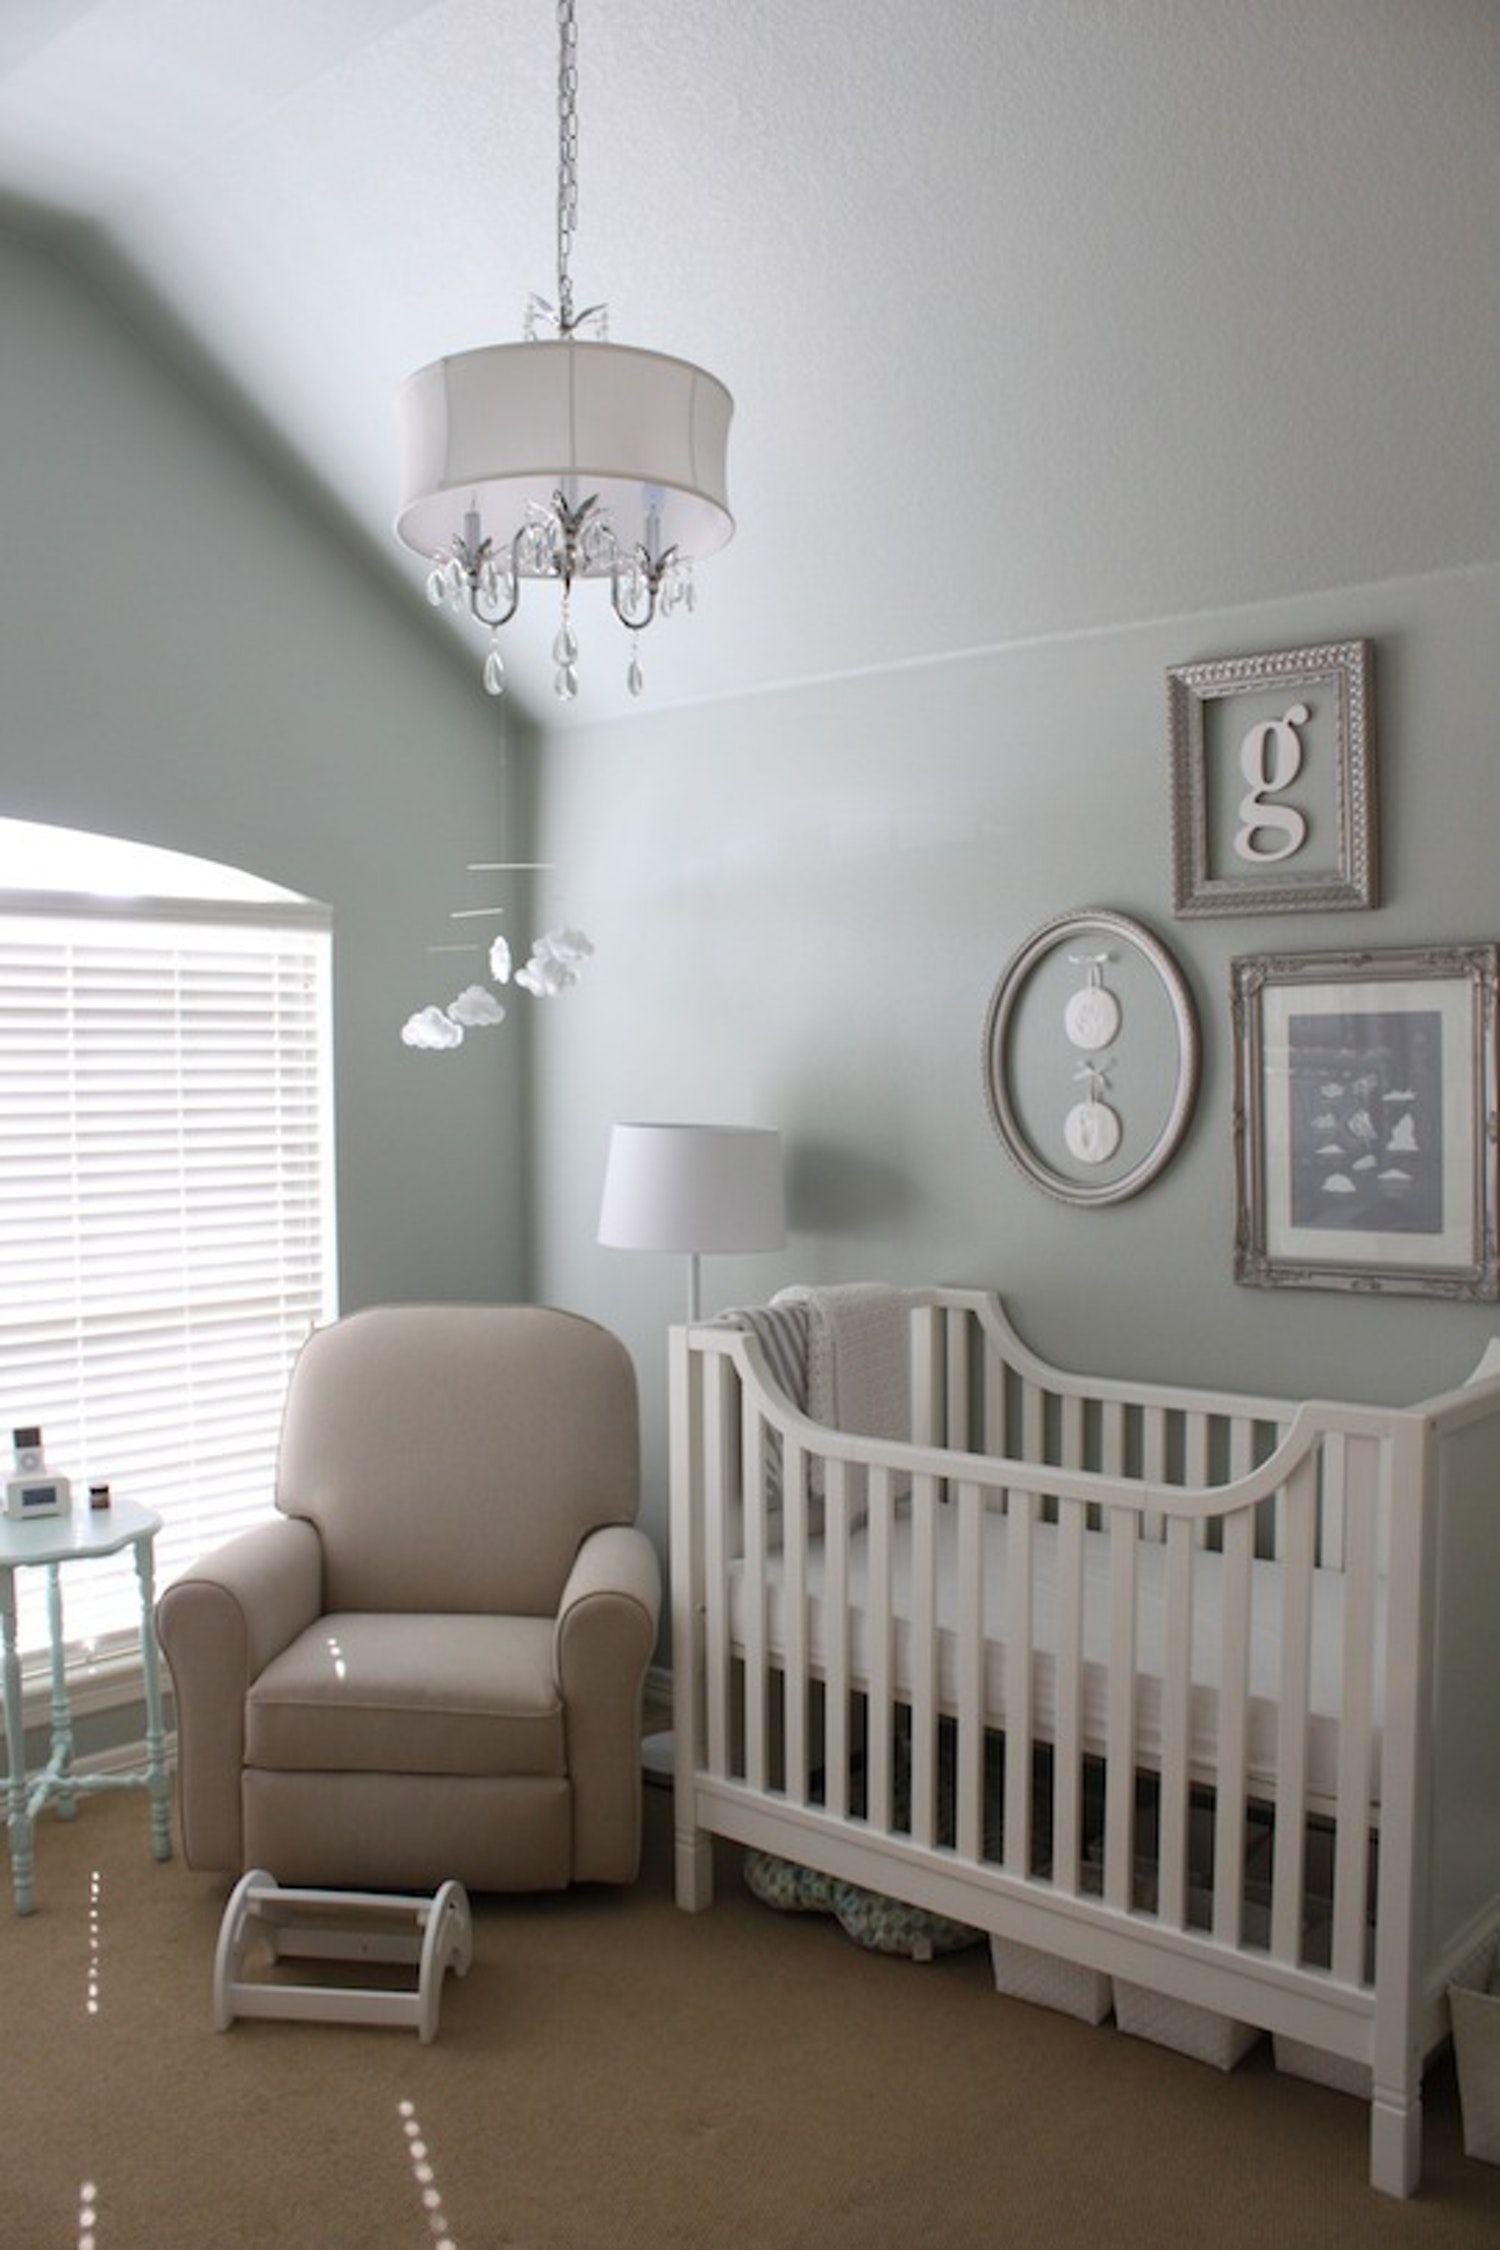 20 Nursery Baby Room Decoration Ideas and